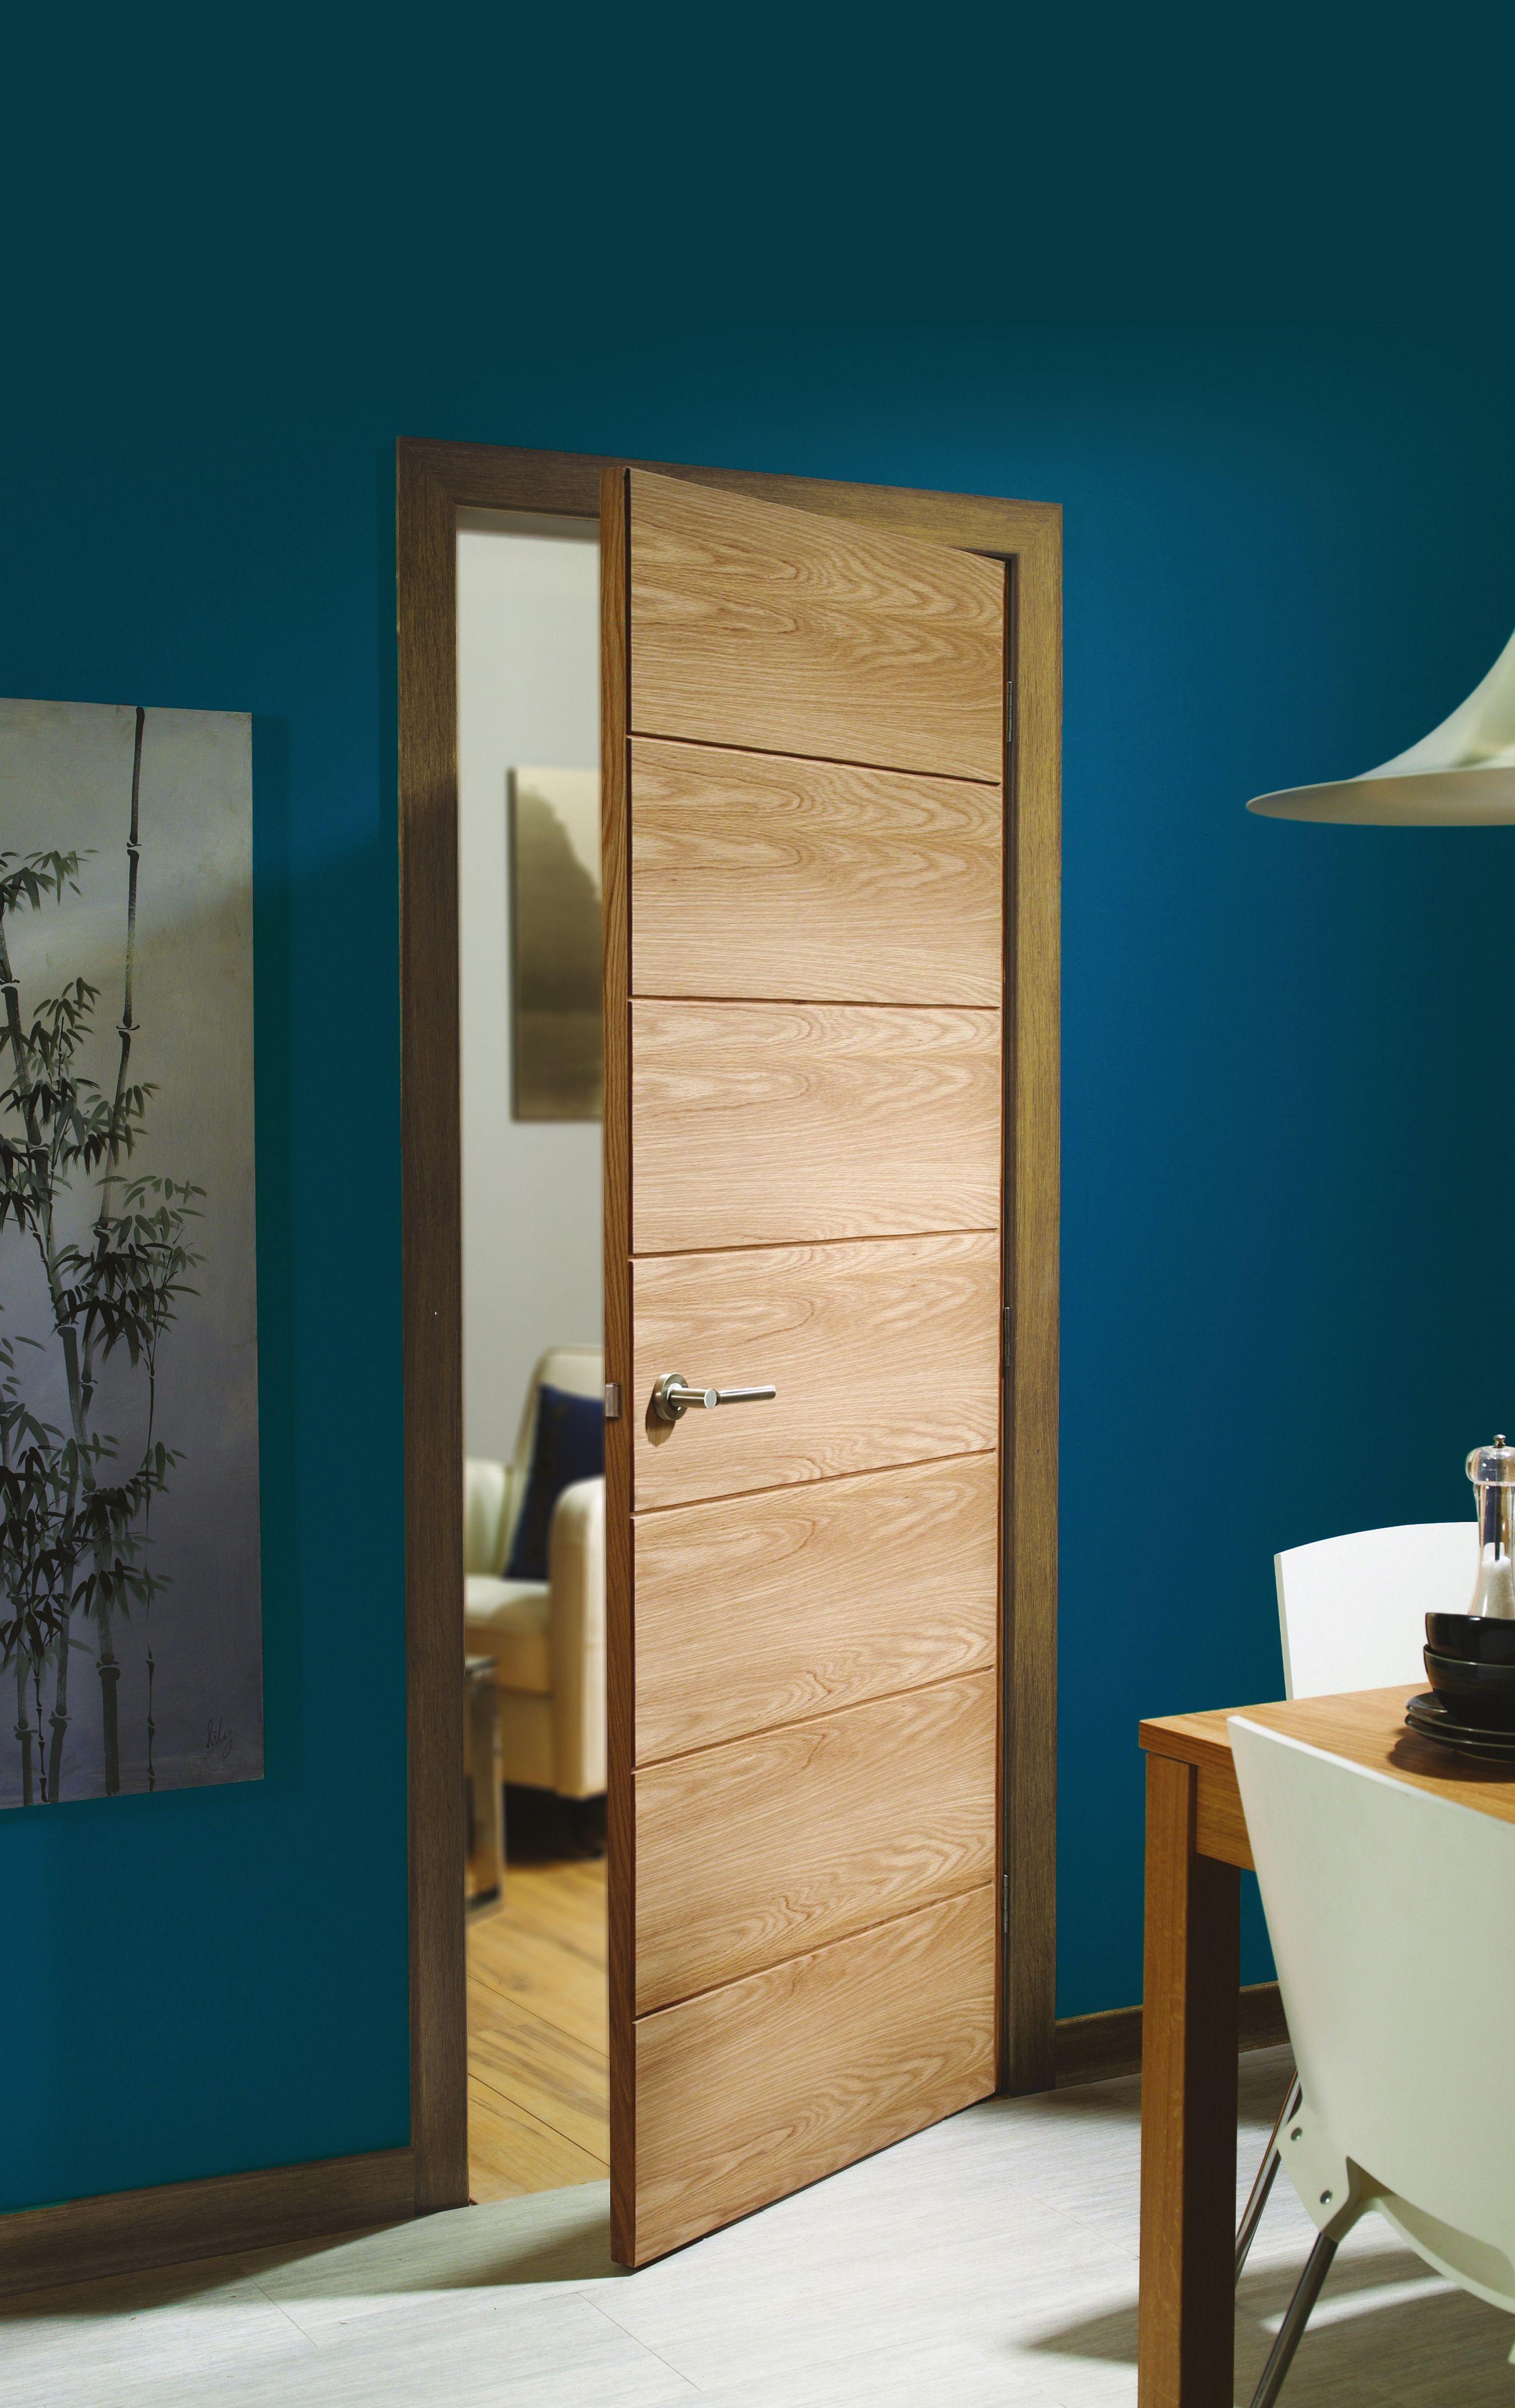 The Oak Savona Is A Horizontally 7 Panelled Veneered Door Suble Panel Design